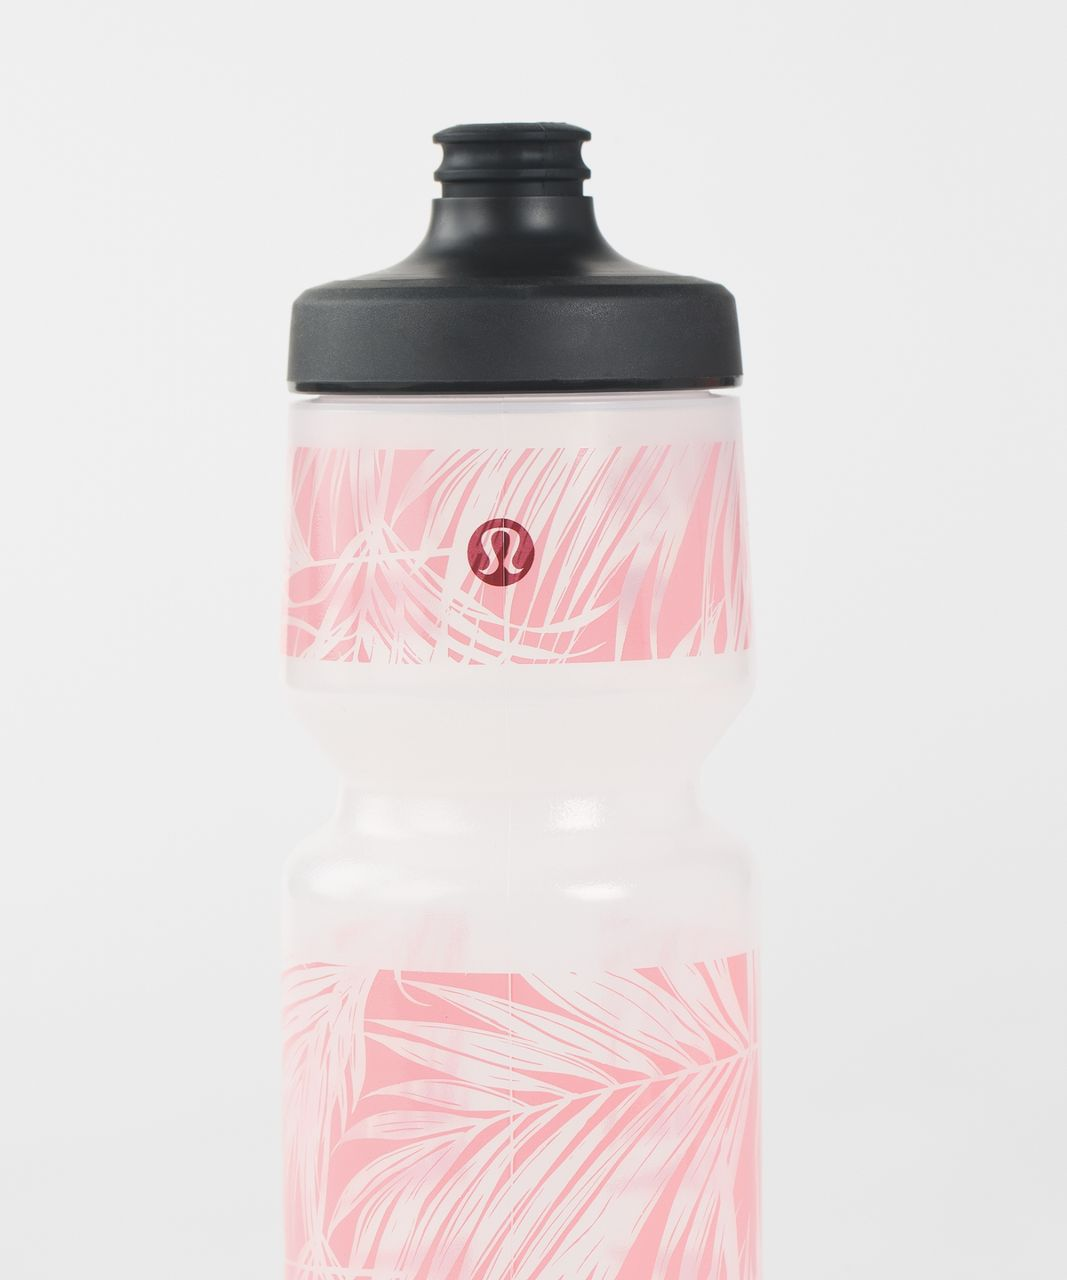 Lululemon Purist Cycling Waterbottle - Palm Lace Purist